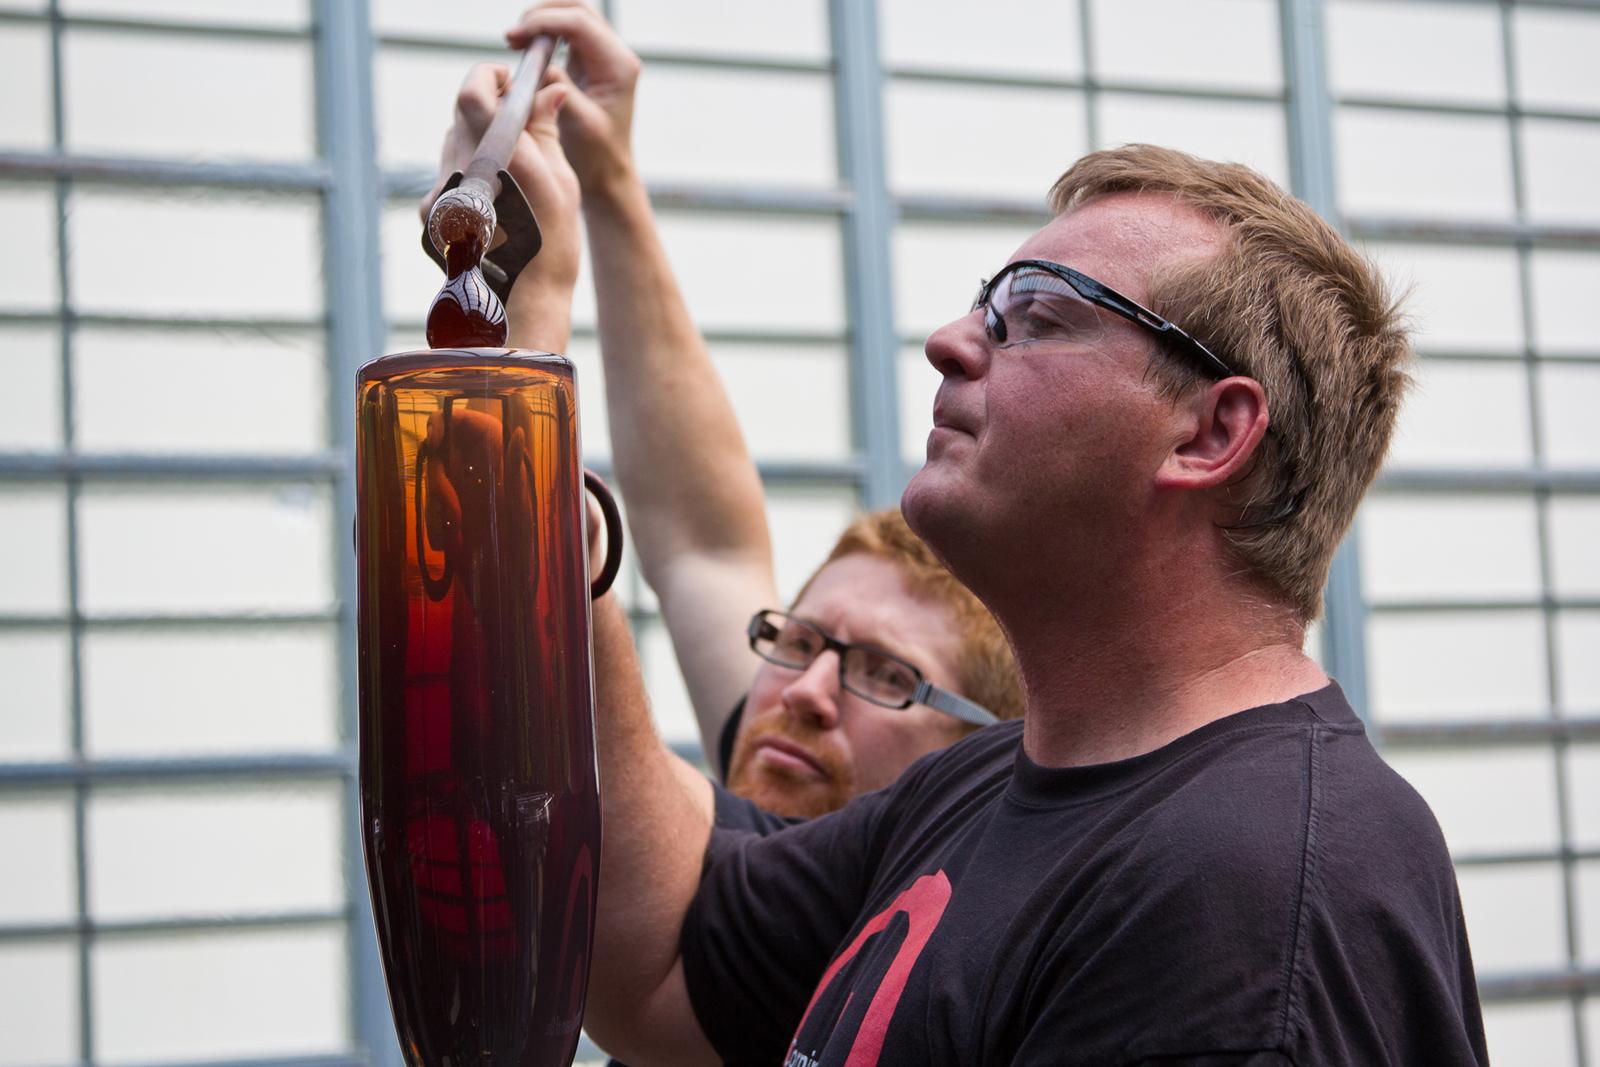 Gaffers George Kennard and Dane Jack work with Masamichi Udagawa and Sigi Moeslinger at GlassLab in Corning